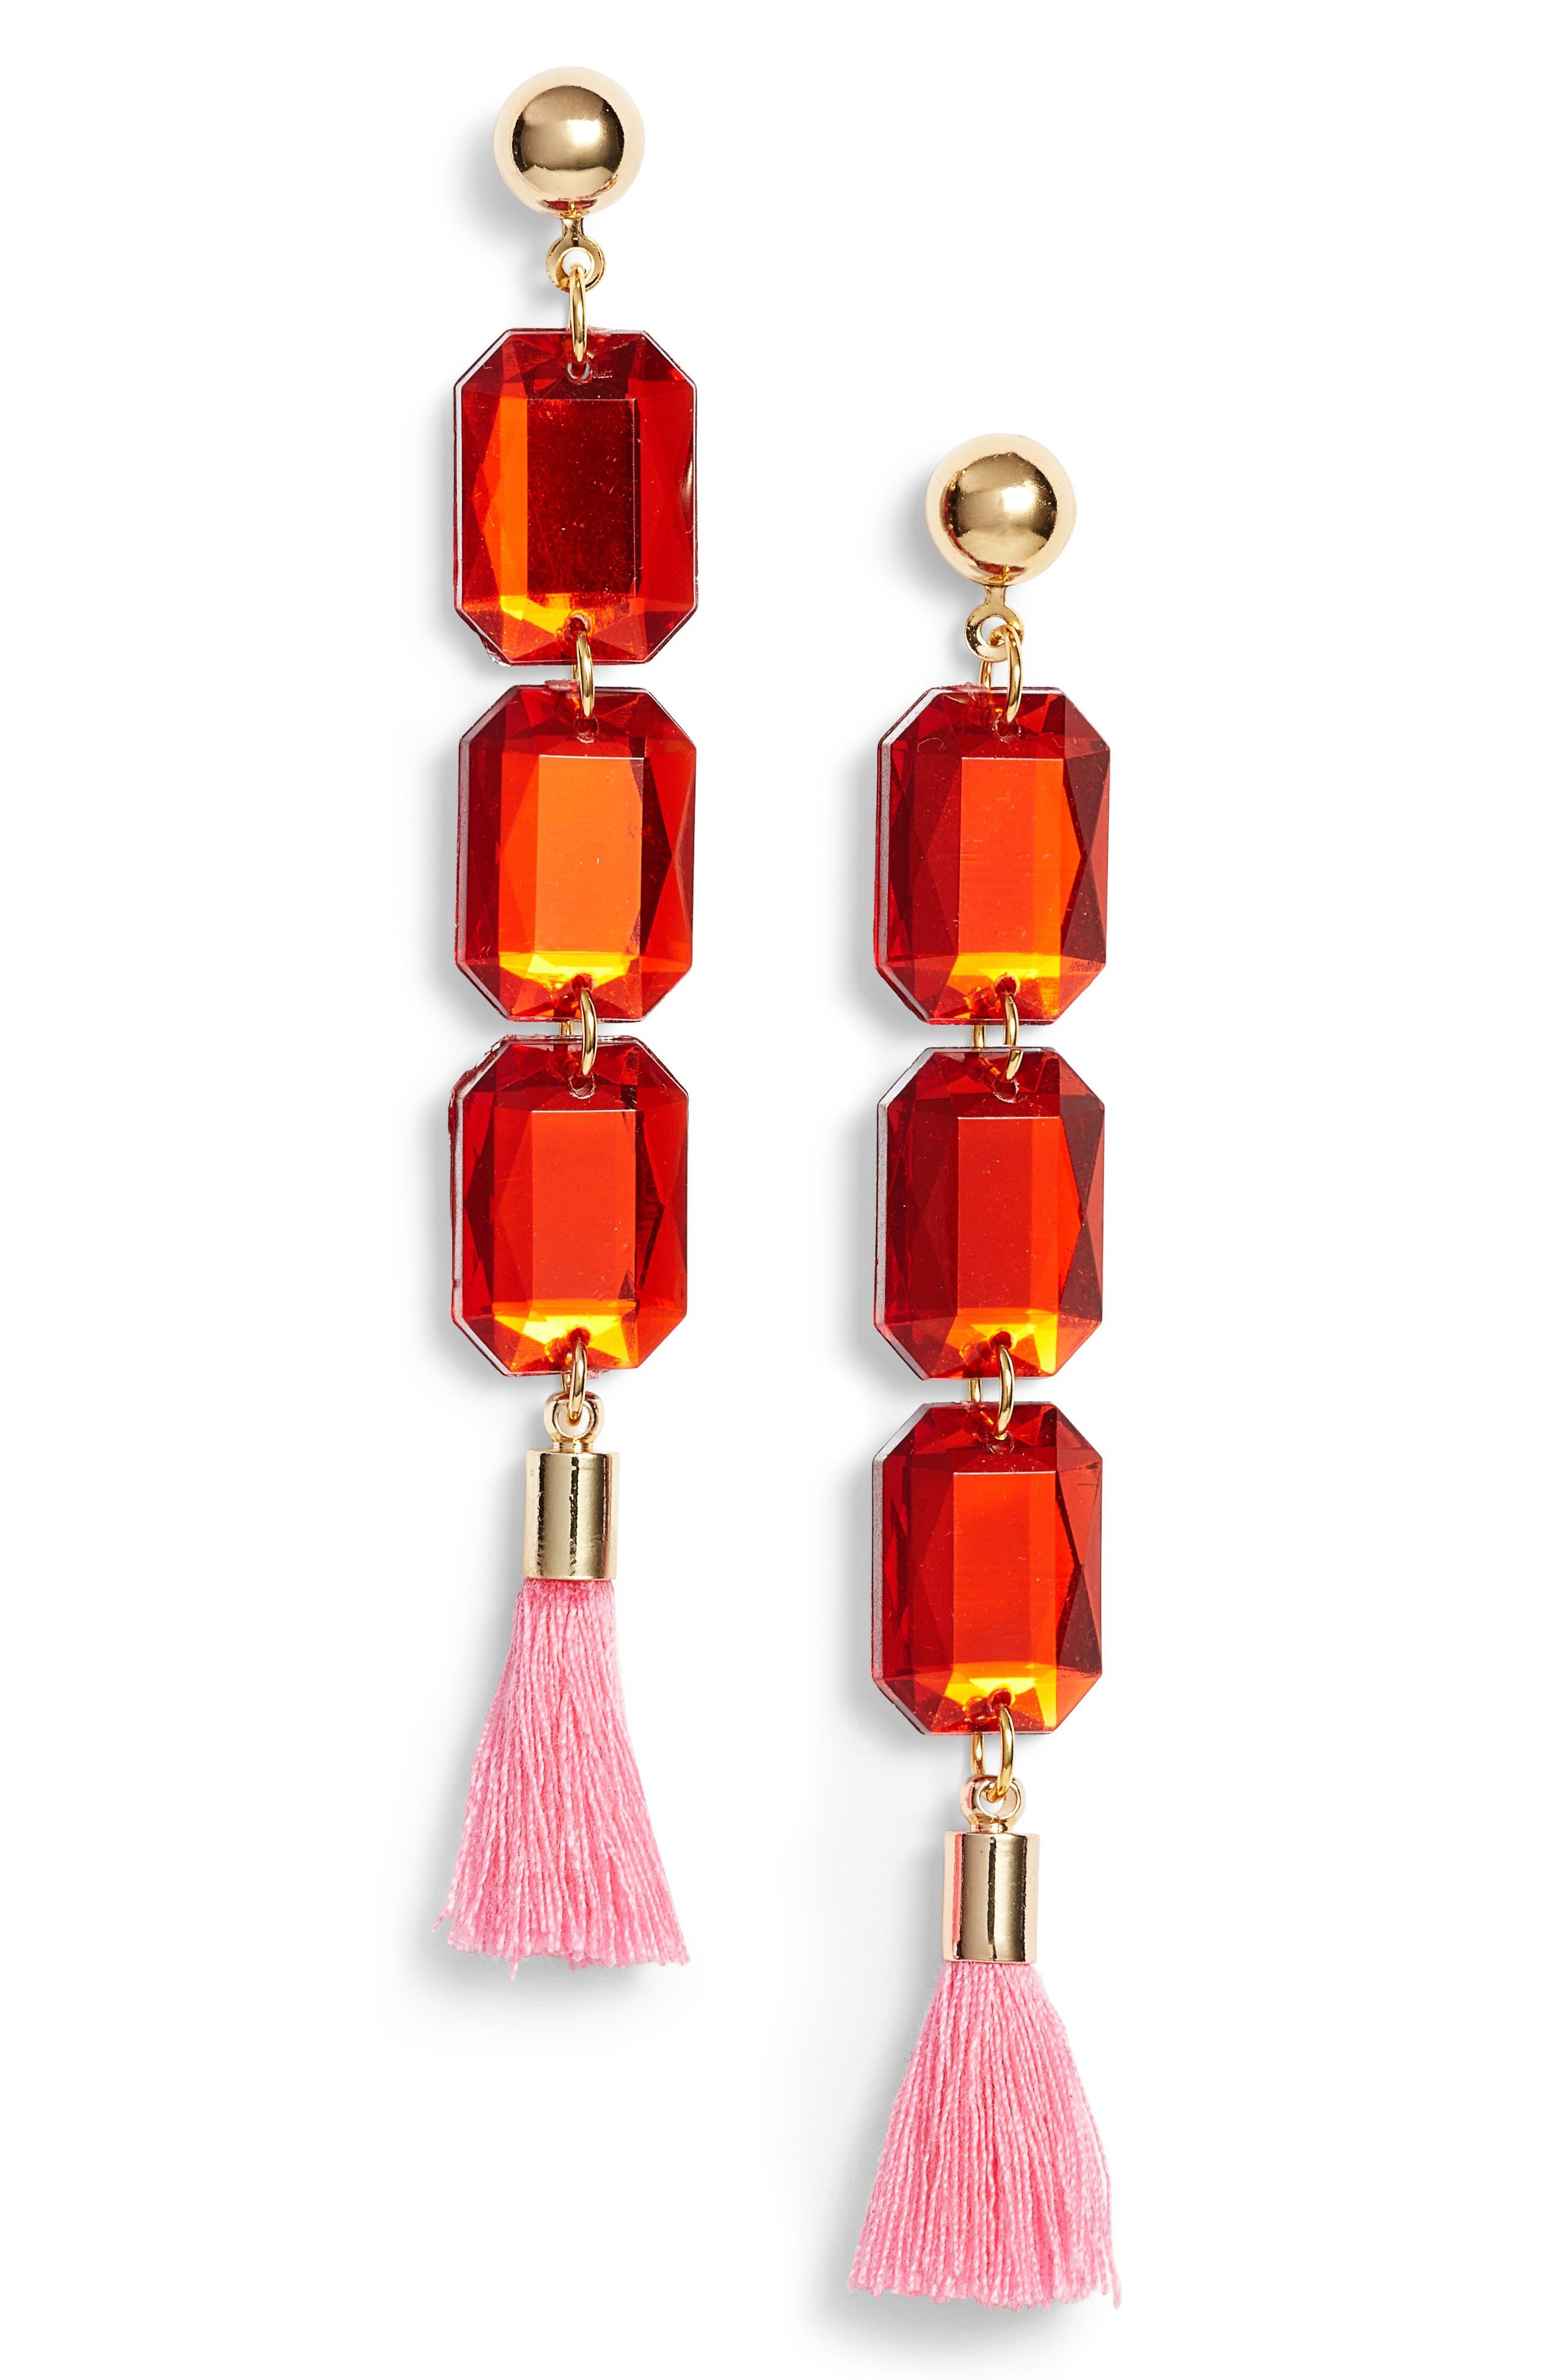 Bon Bon Drop Earrings,                         Main,                         color, Gold/ Red/ Pink